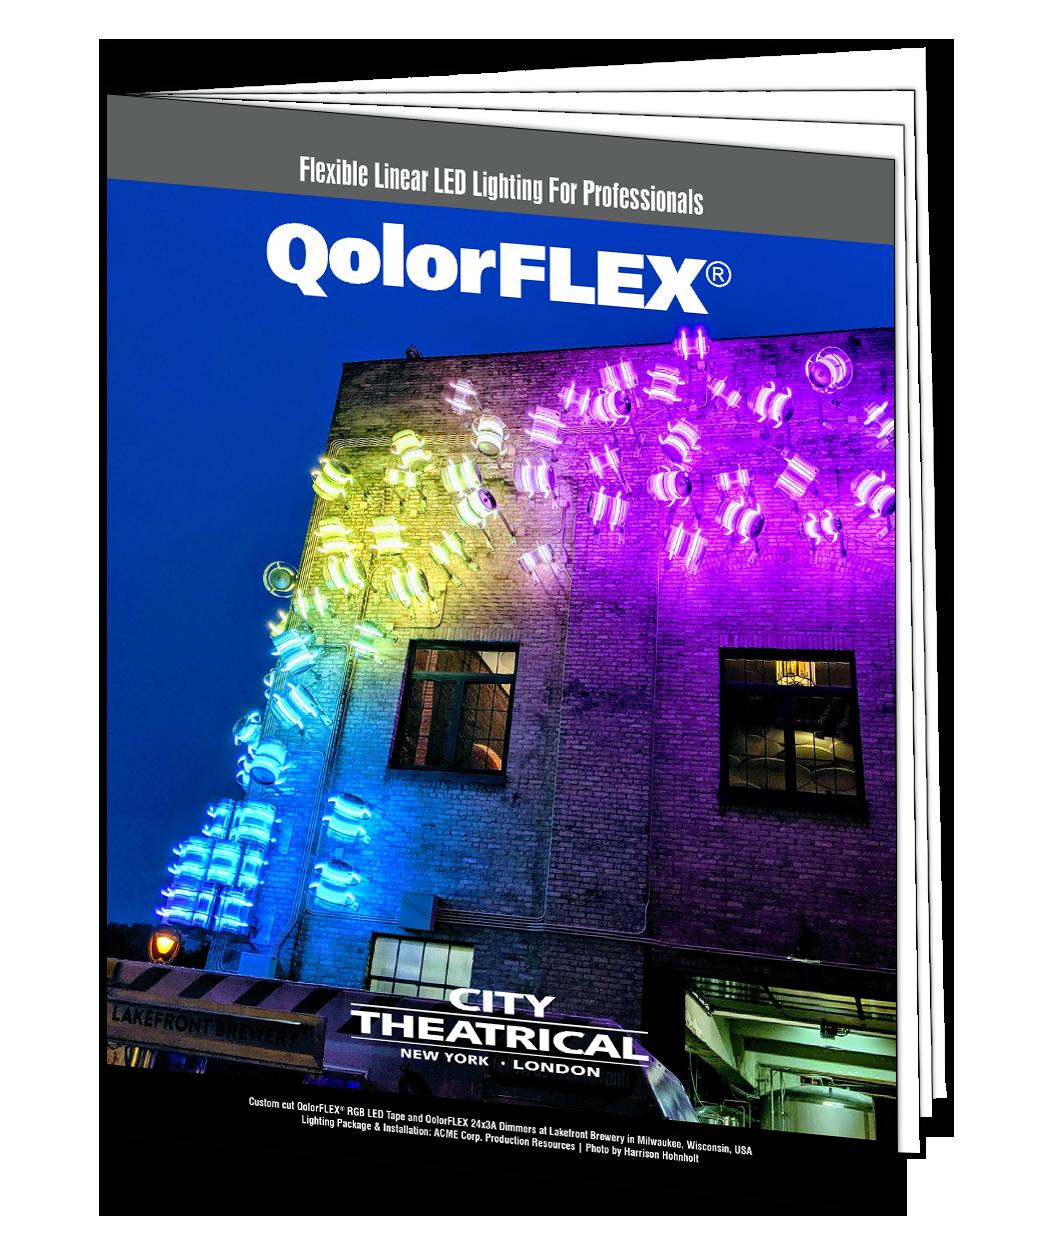 QolorFLEX Brochure by City Theatrical